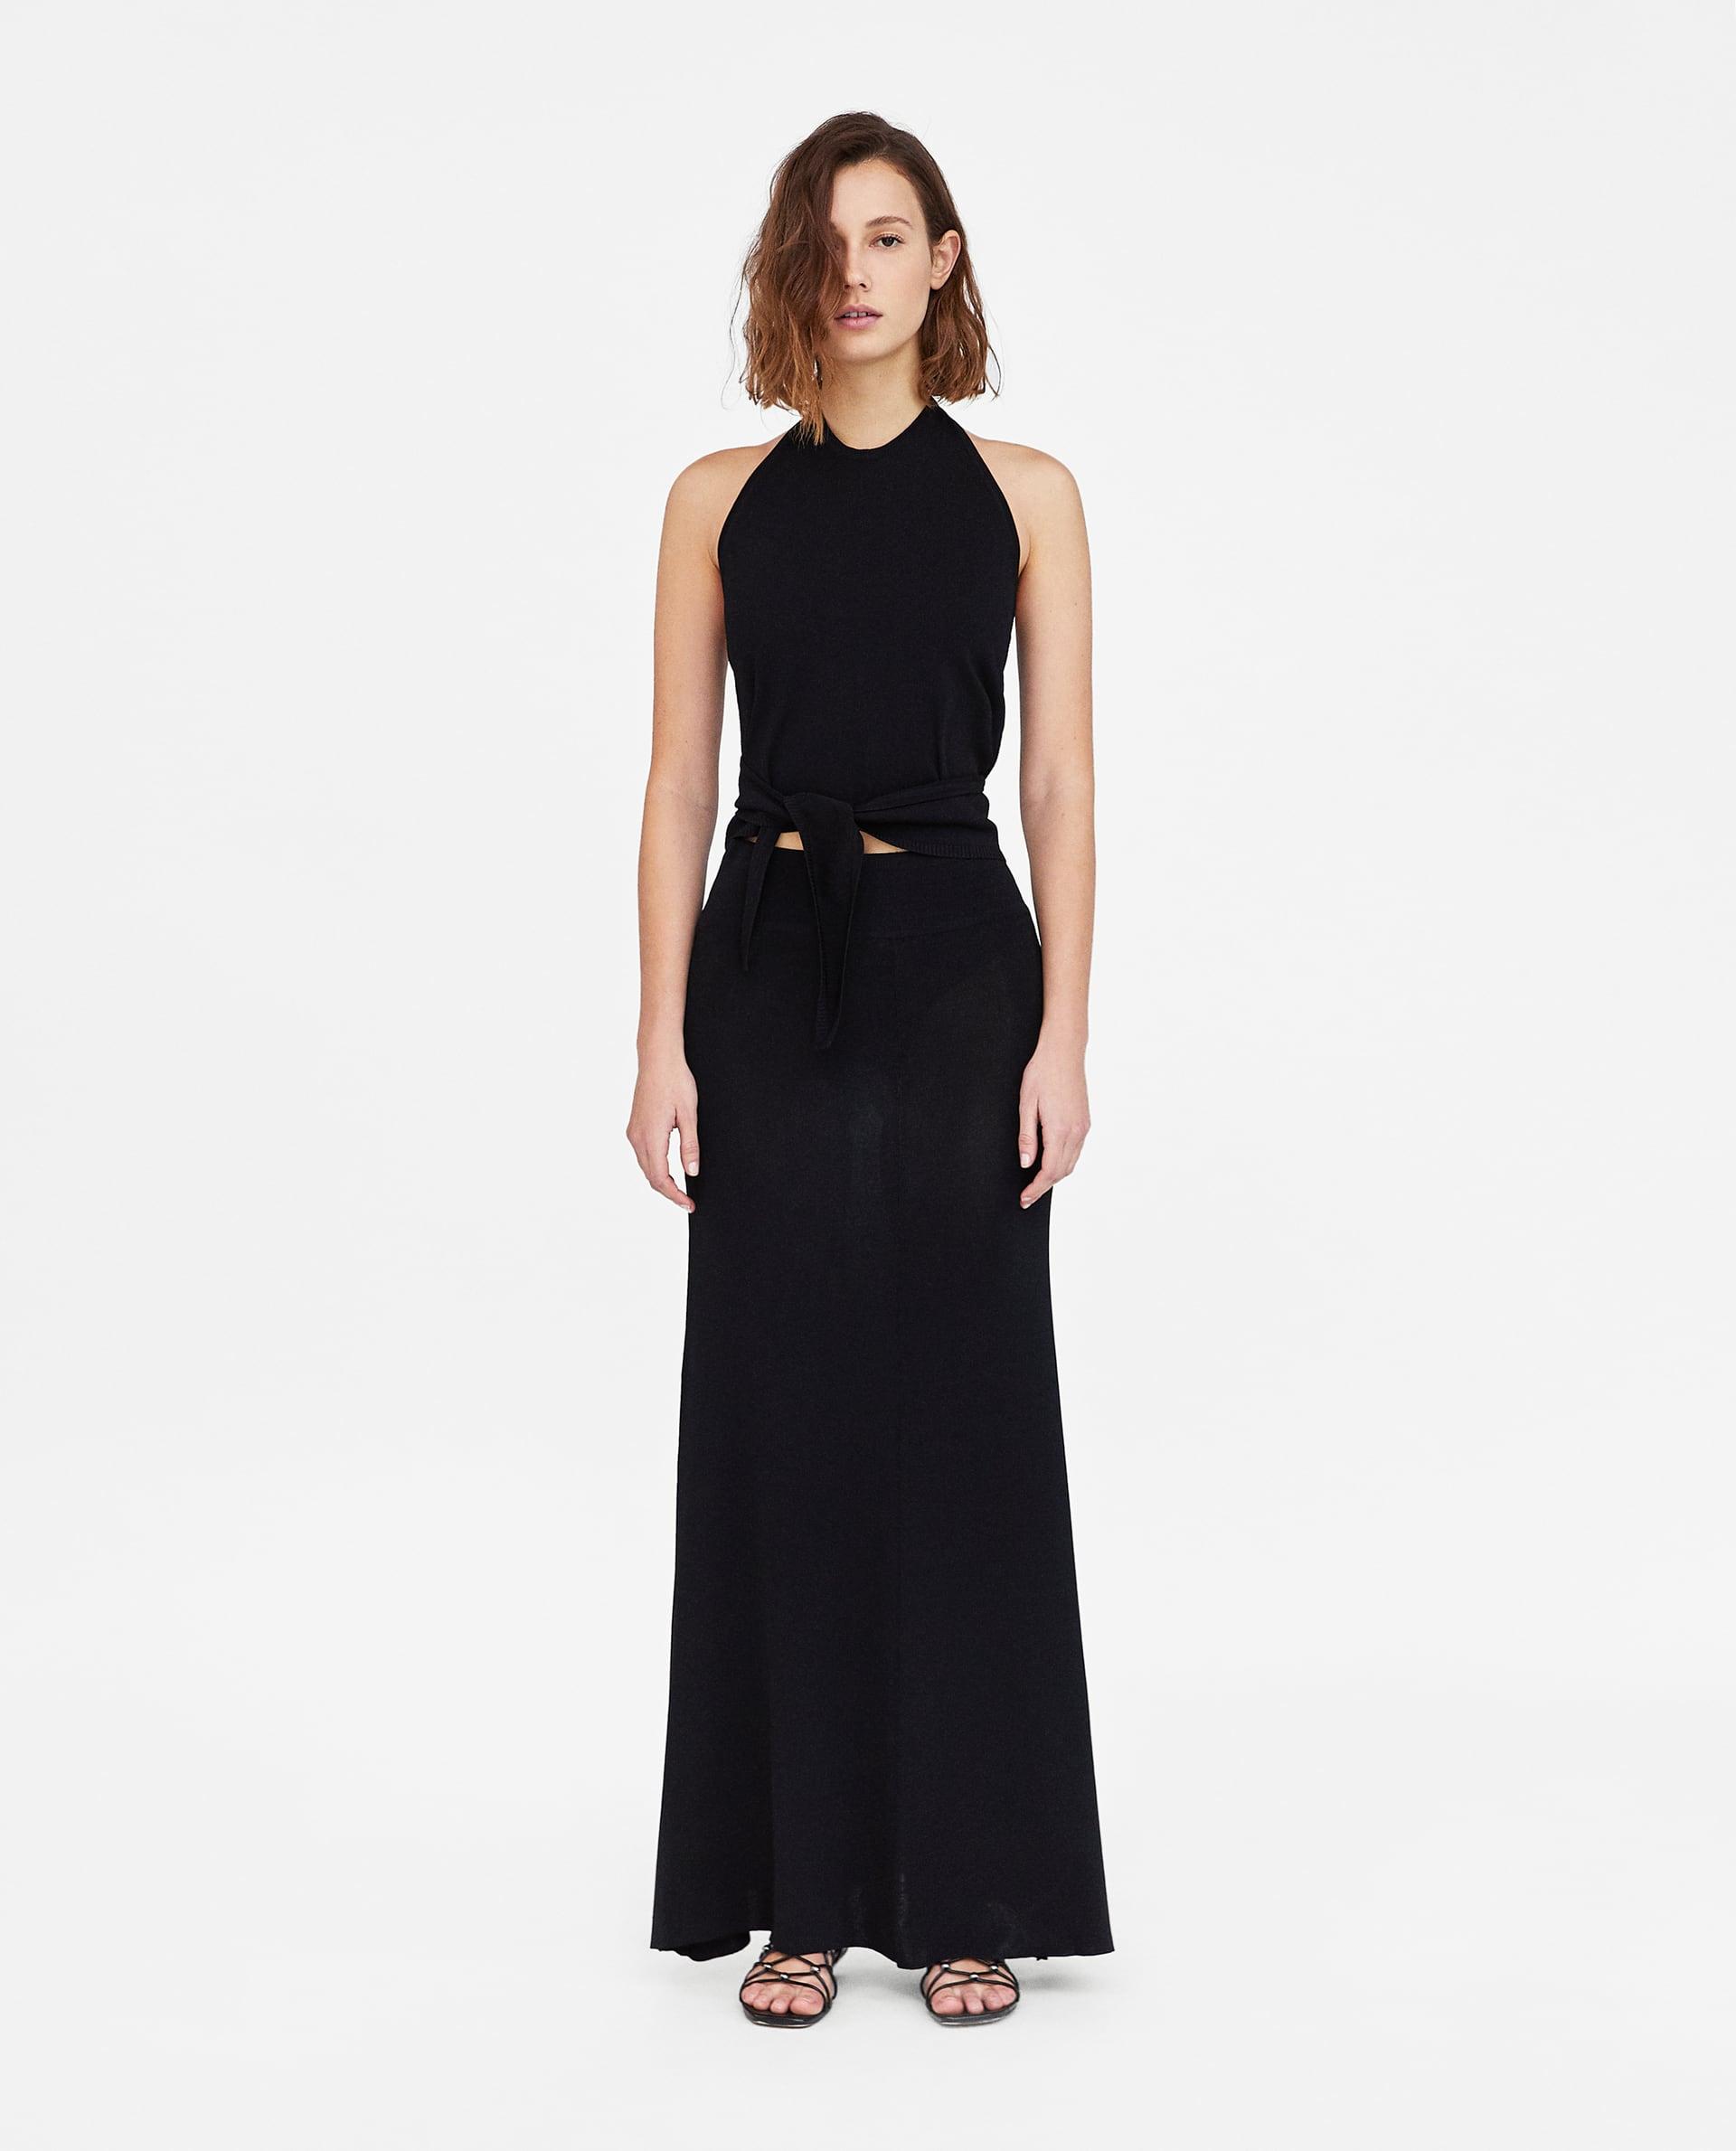 Minimal Halter Top and Skirt